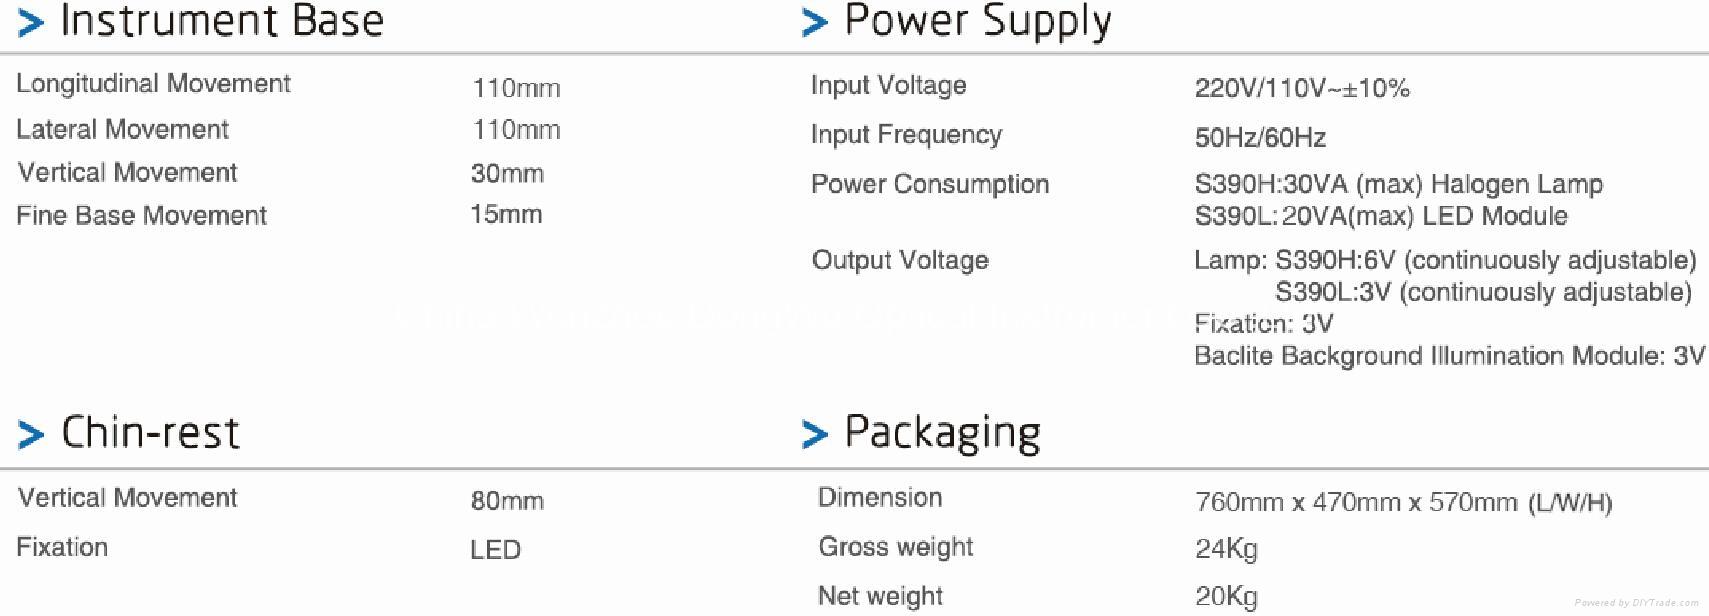 Electric-Focus Digital Slit Lamp 8